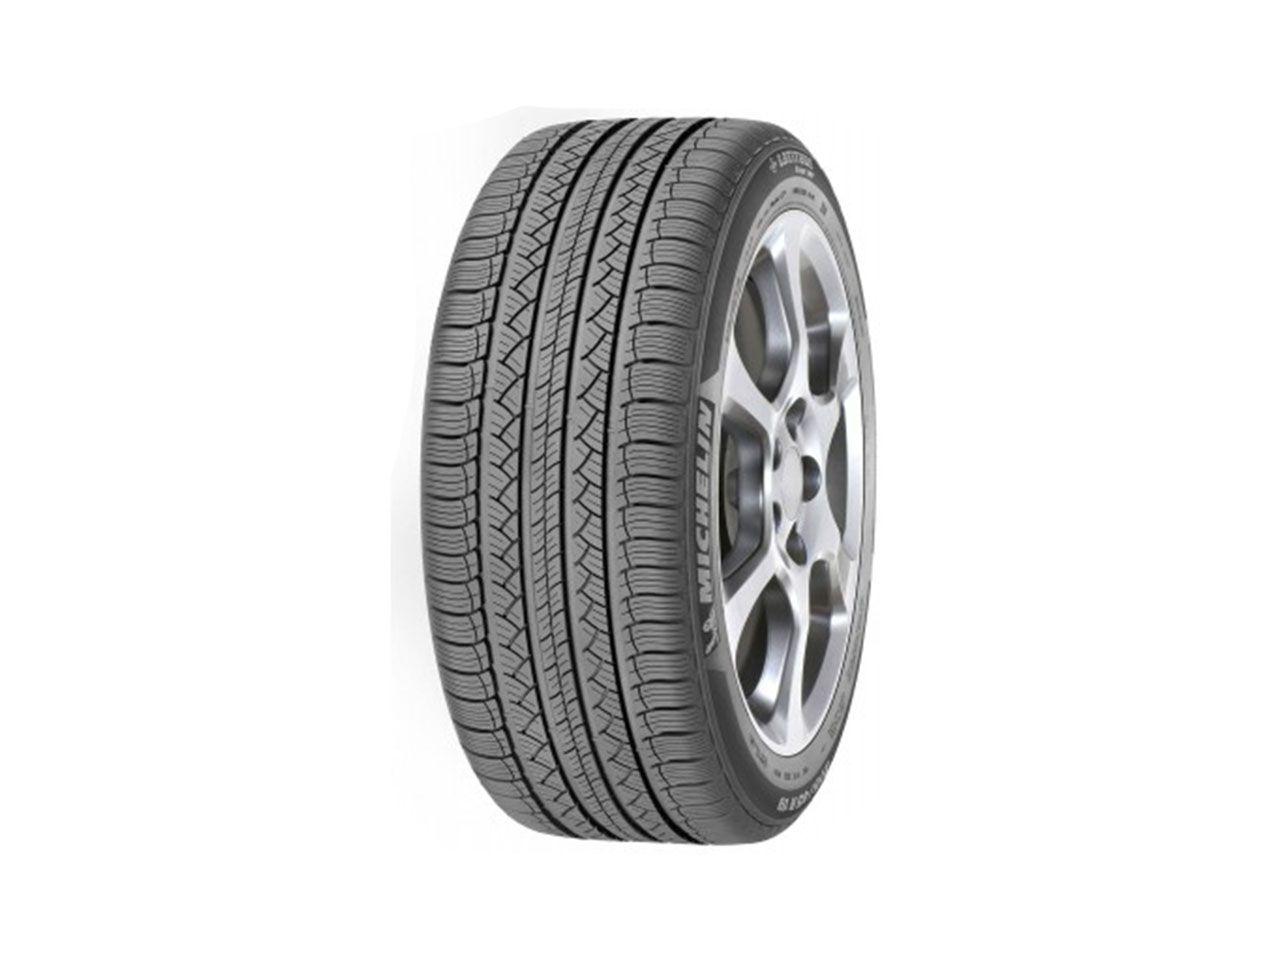 Pneu Michelin 265/60R18 Latitude Tour 110V  - Mirai Peças Toyota